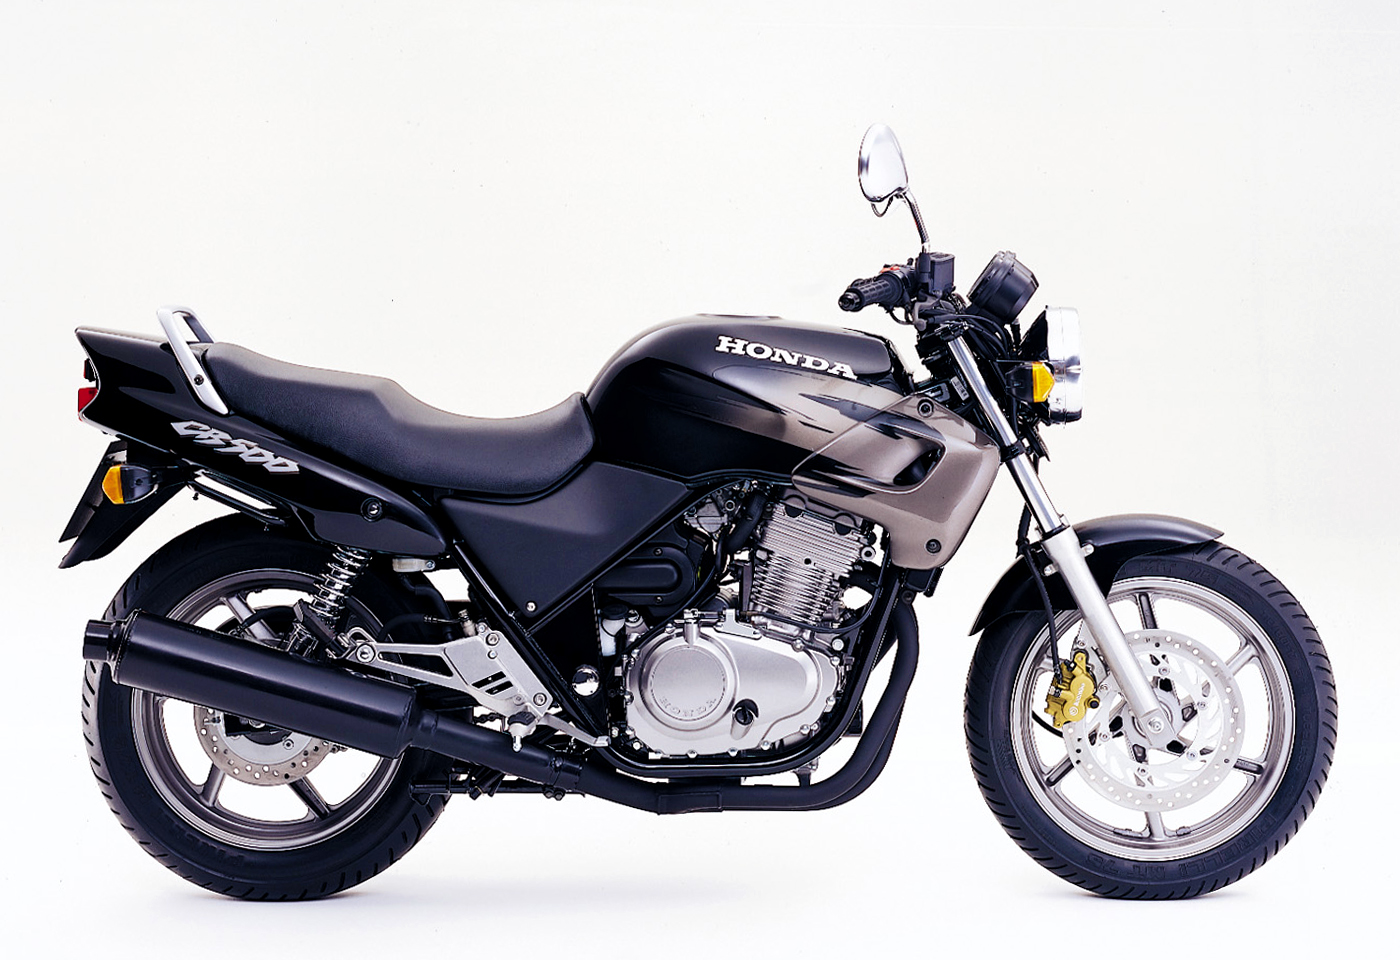 Honda Cb 500 La Meilleure Chose à Acheter Avec 1000 Euros